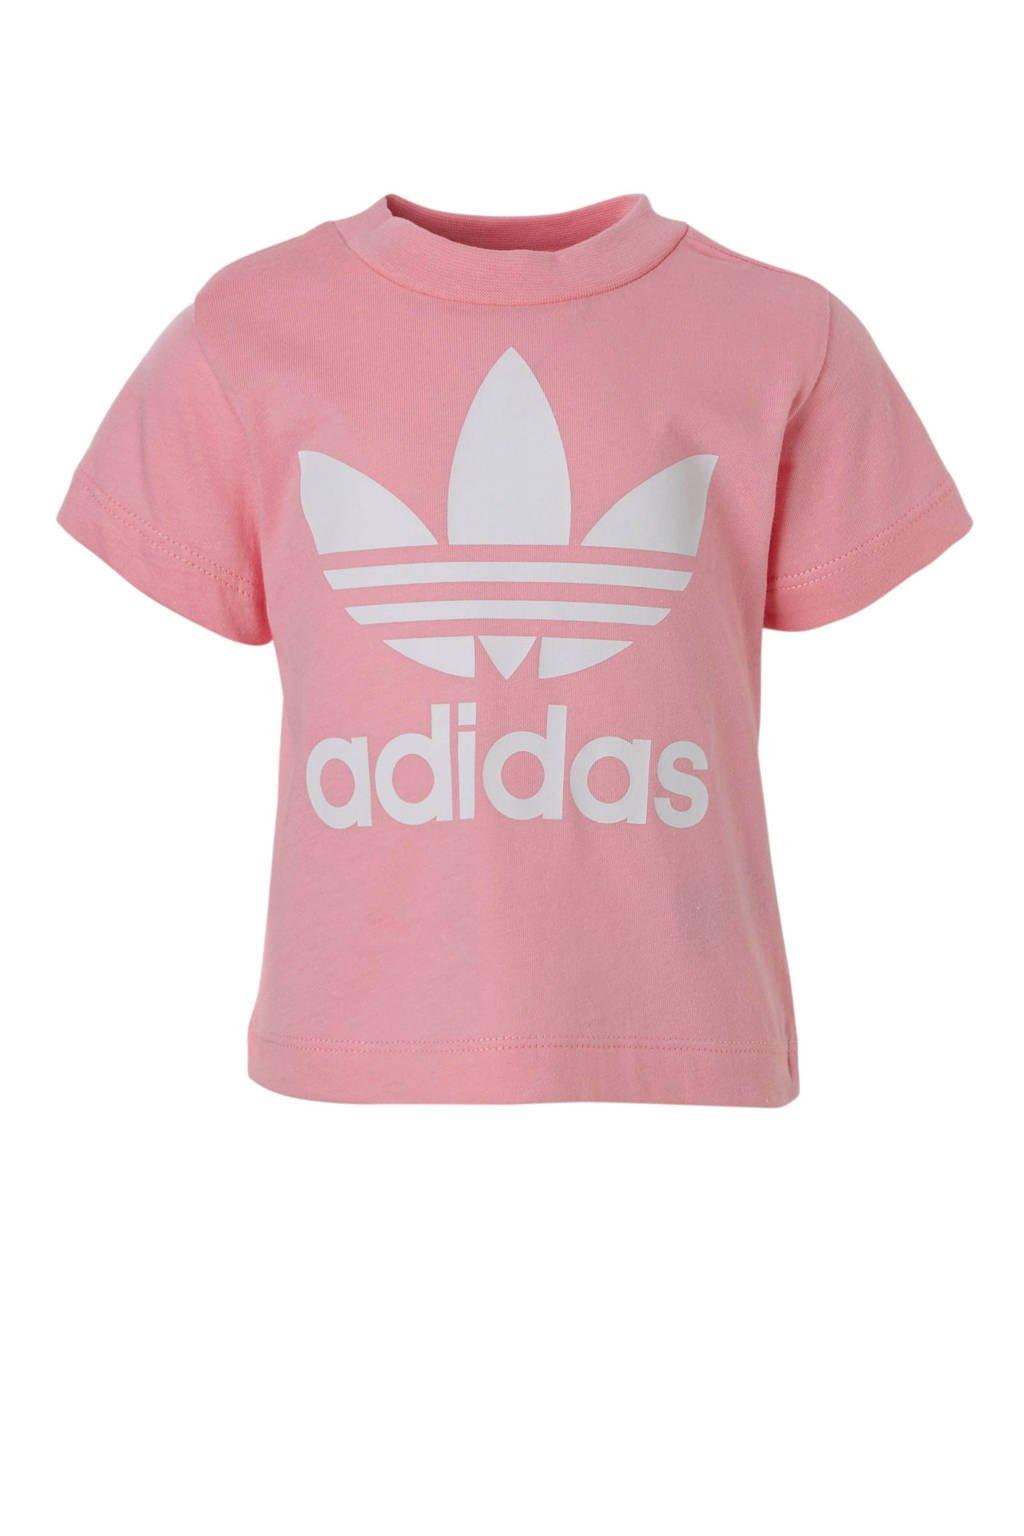 adidas Originals T-shirt roze, Roze/wit